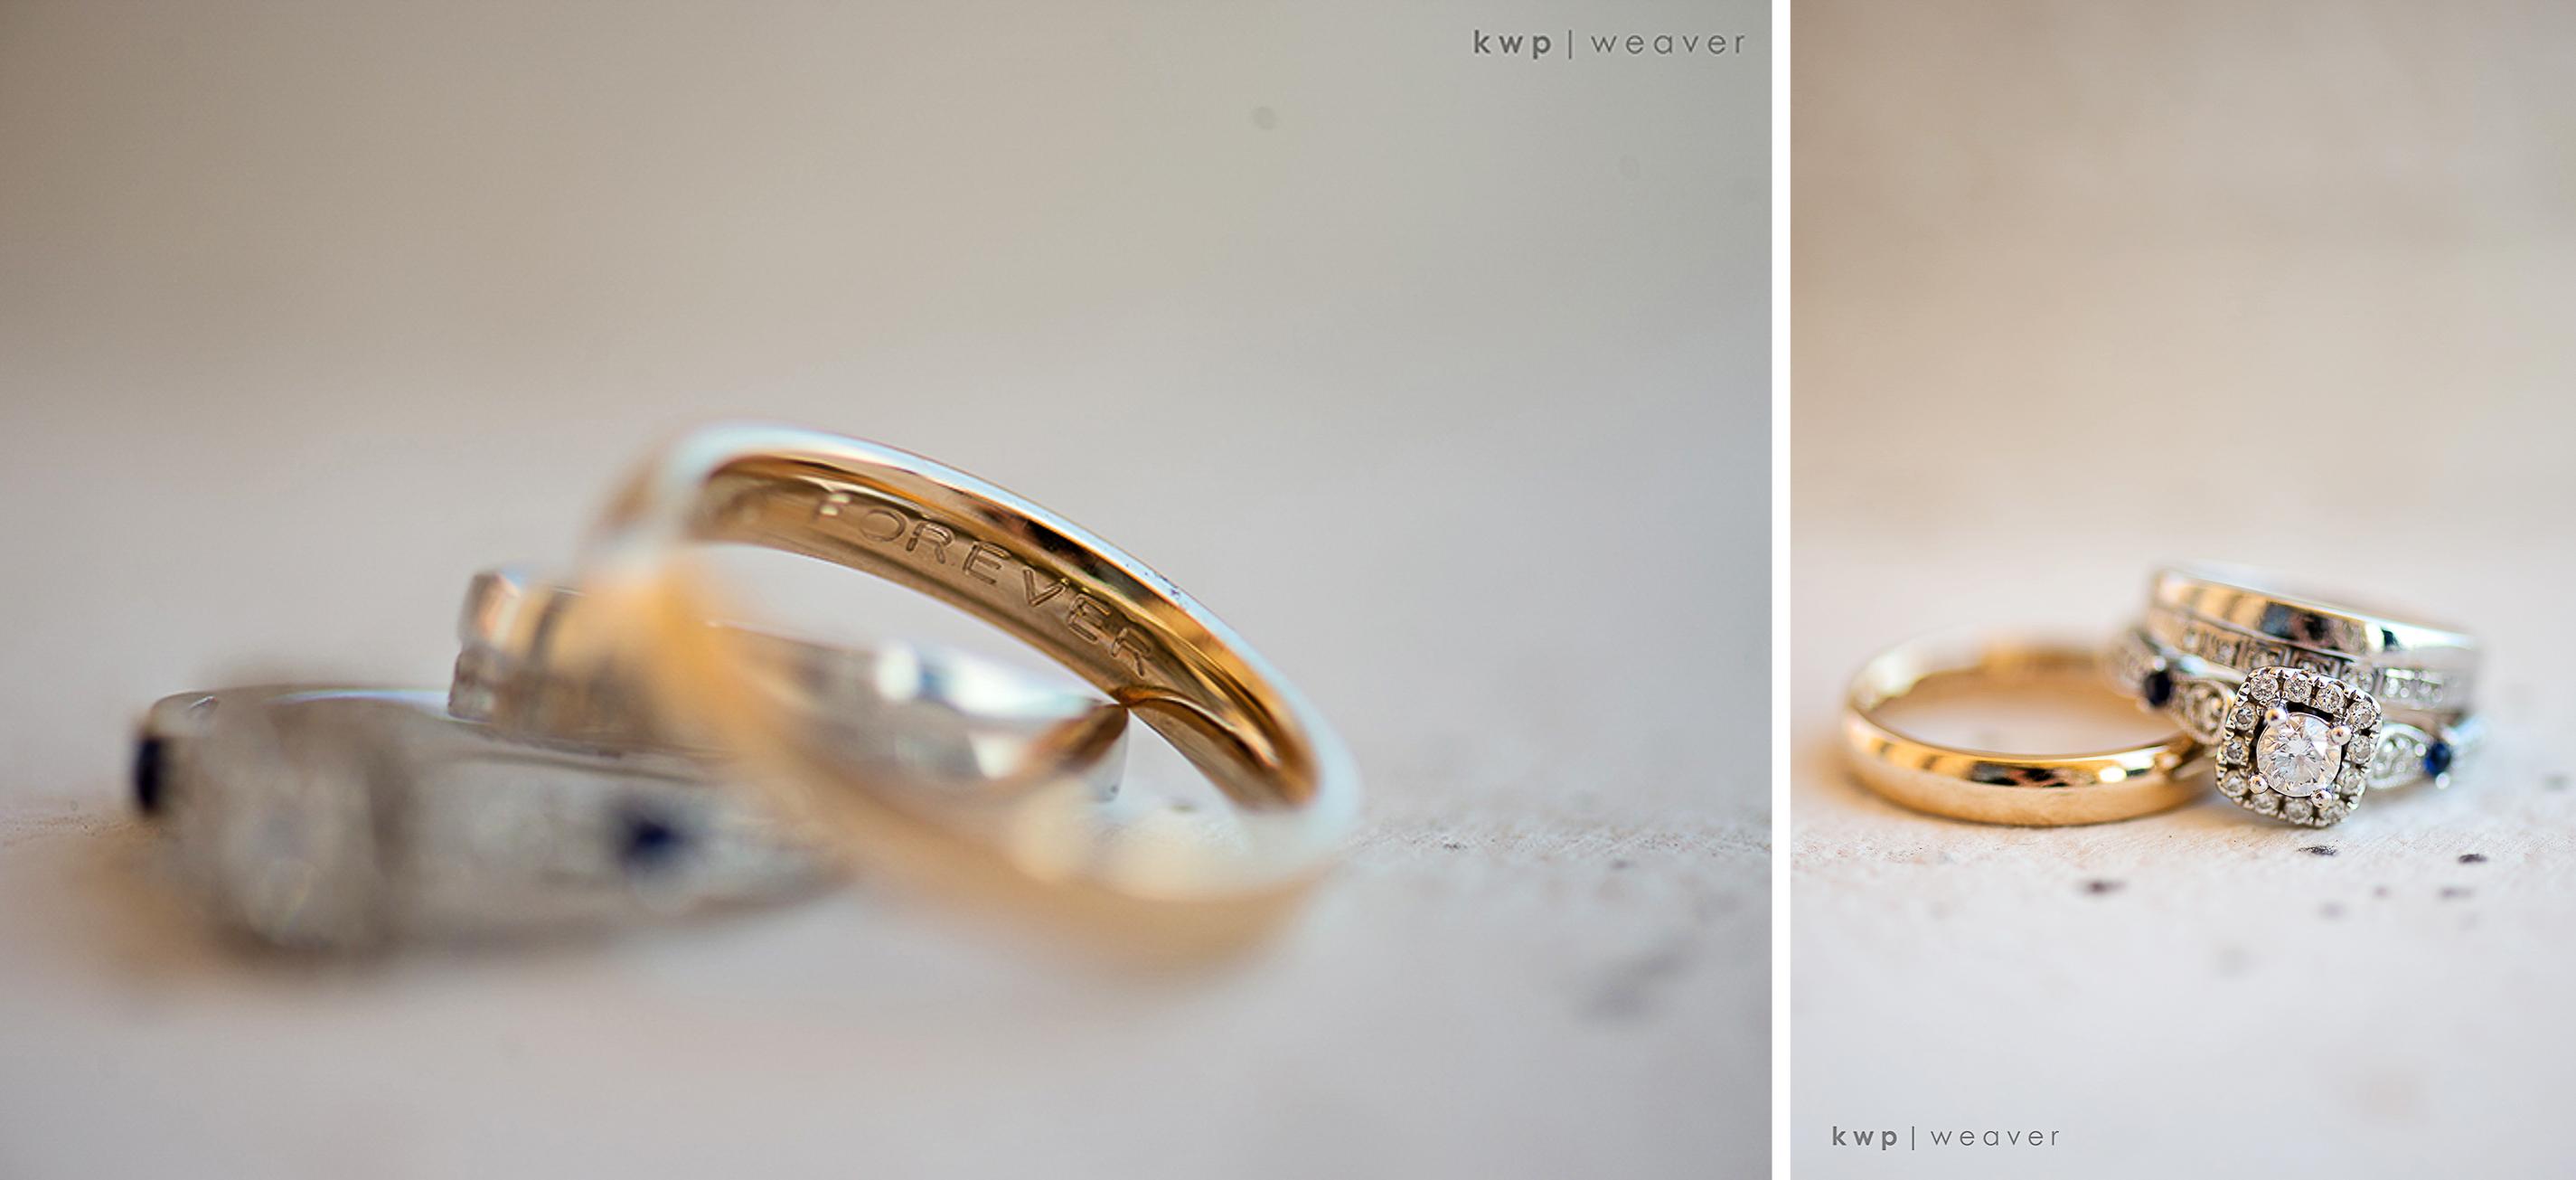 engraved wedding band